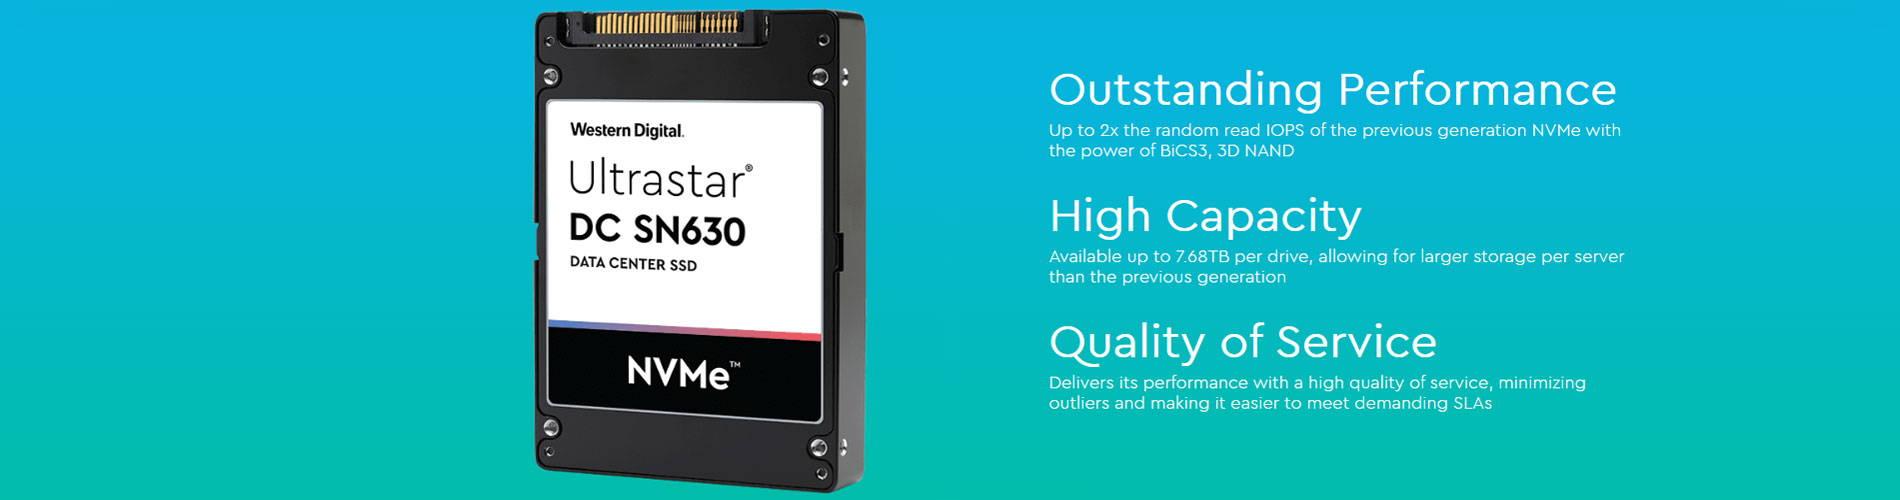 Ultrastar DC SN630